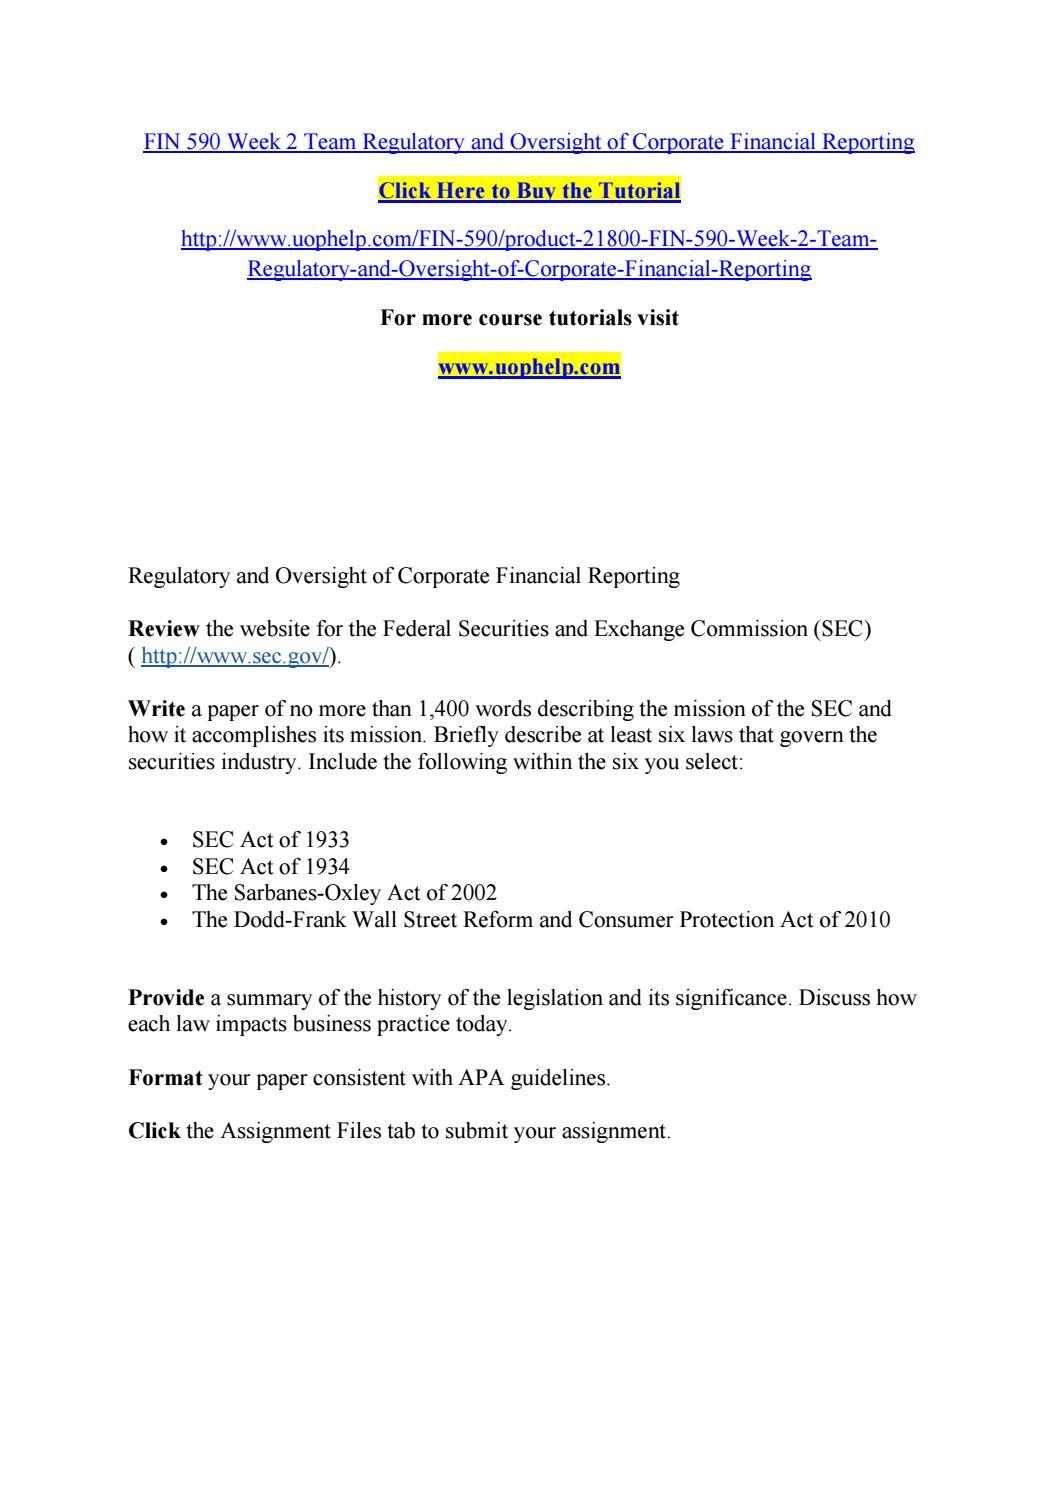 Fin 590 week 2 team regulatory and oversight of corporate